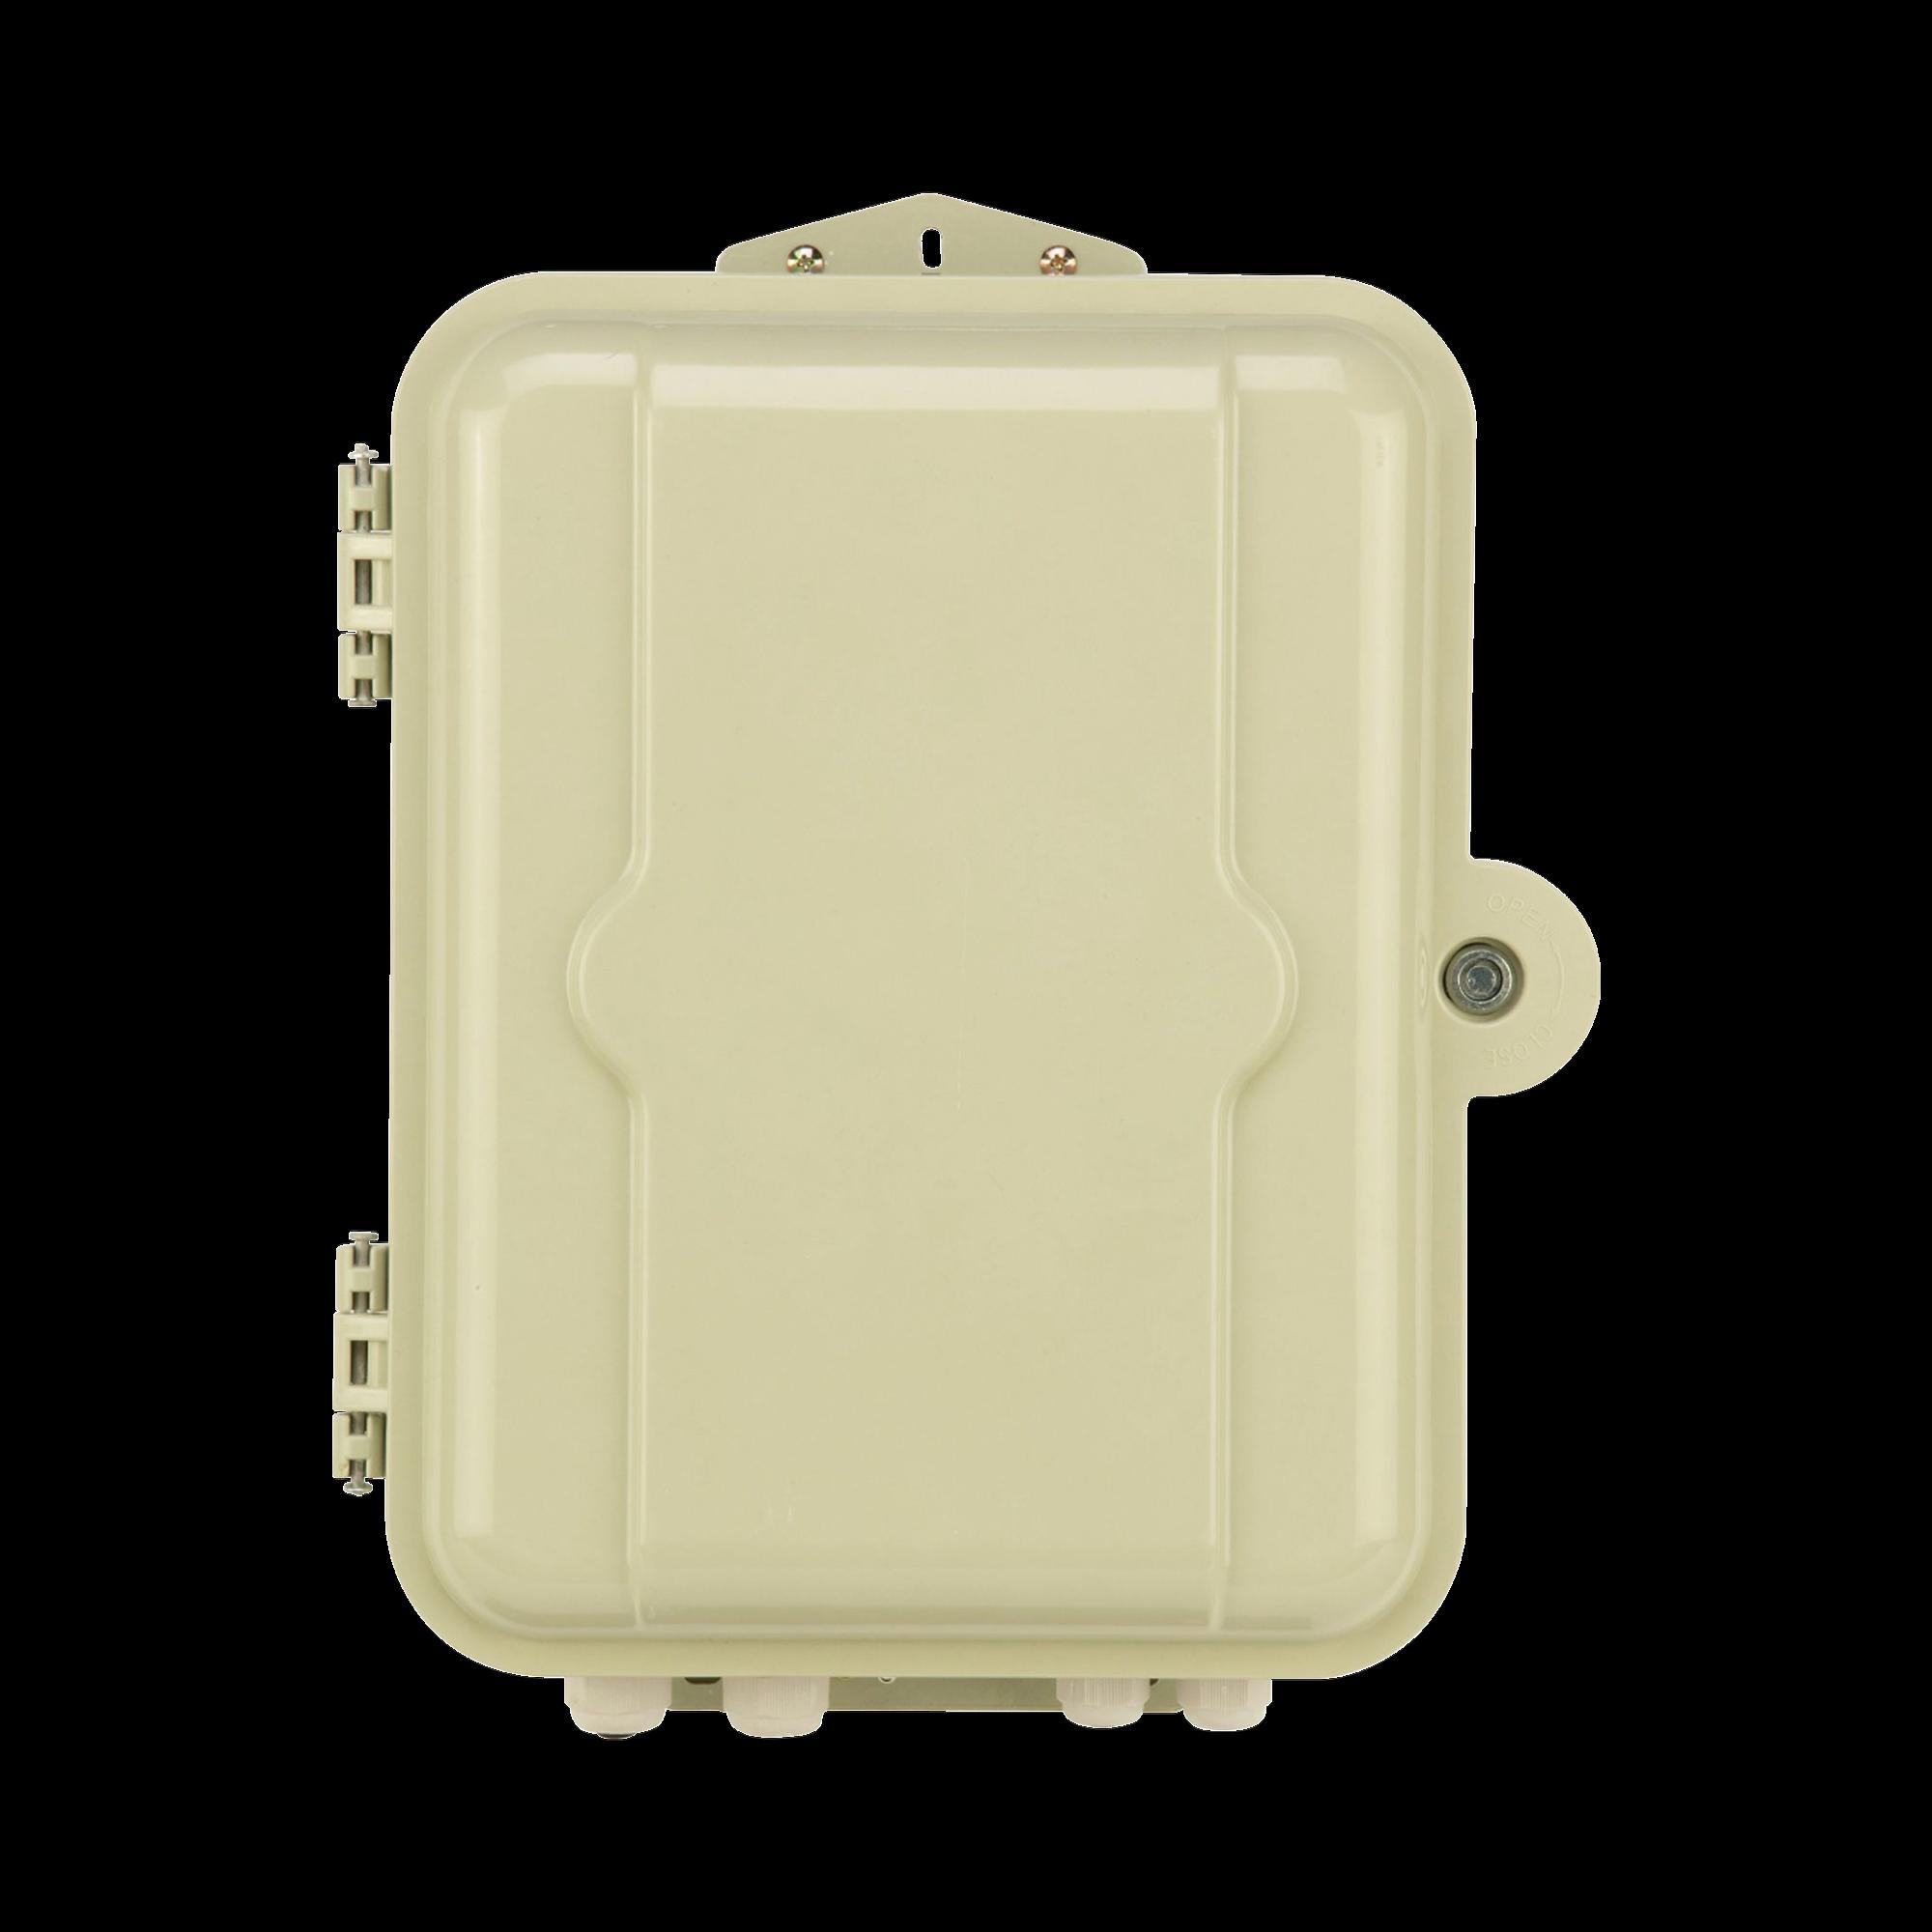 Gabinete Pasivo de Fibra óptica, Acepta Dos Placas FPONEAP12, IP55, Montaje en Poste o Pared